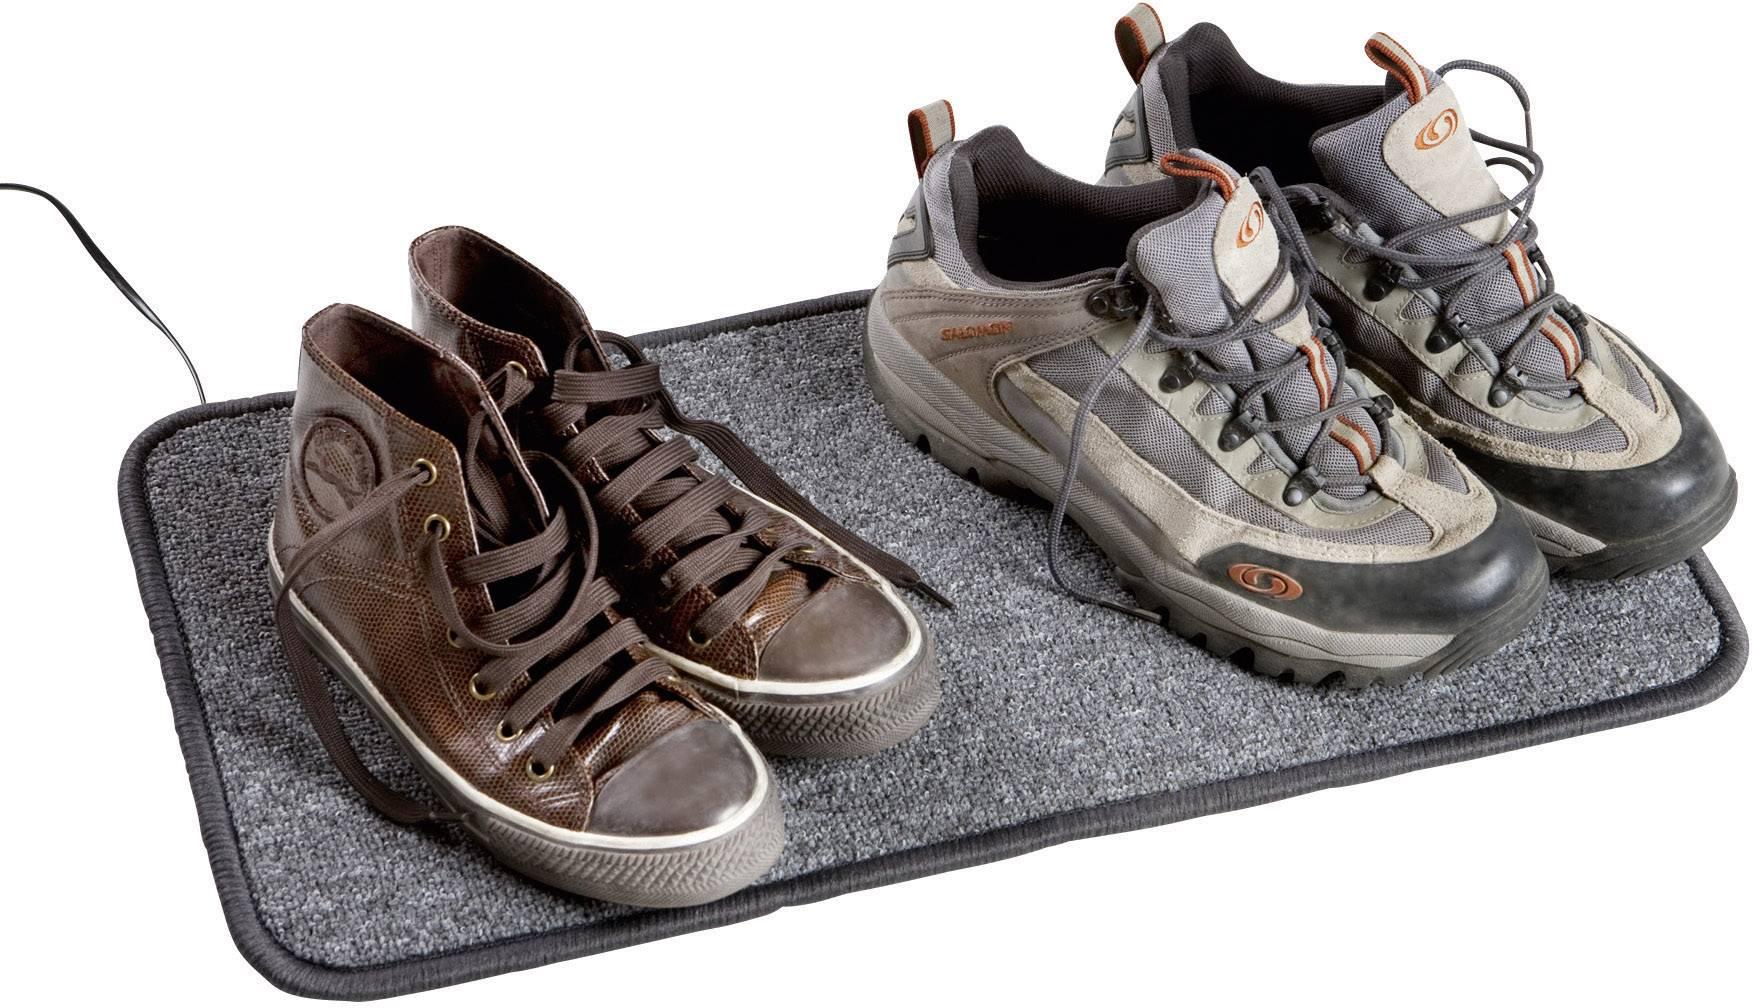 Sušička topánok Arnold Rak FH21030 611256, (d x š x v) 100 x 30 x 1.5 cm, antracitová